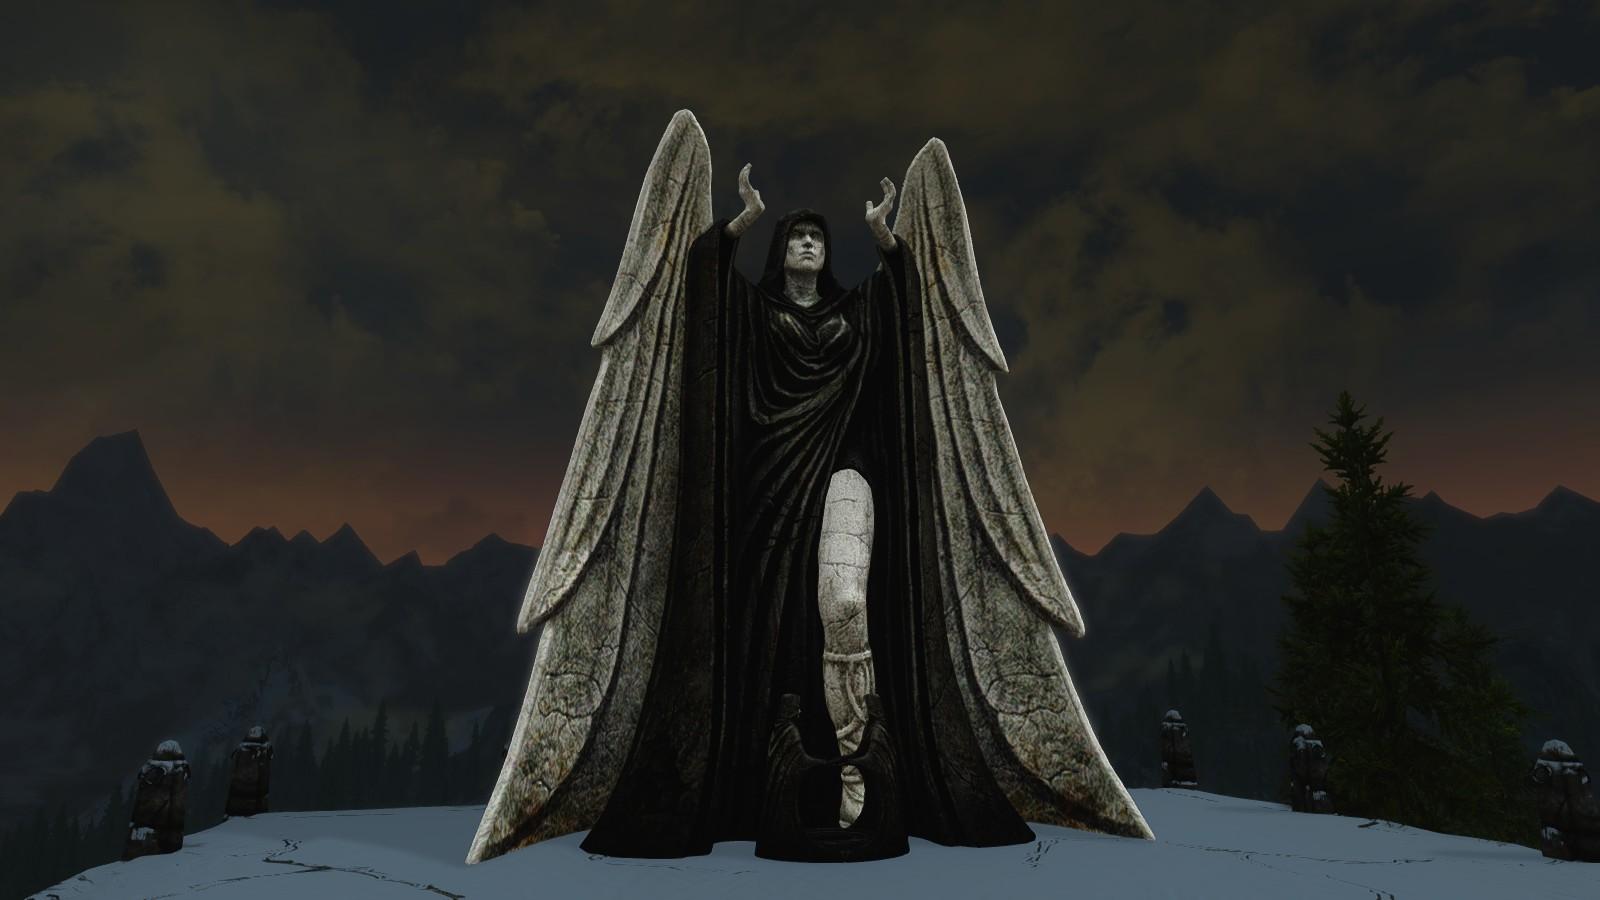 melancholic meridia the elder scrolls mods wiki fandom powered by wikia Oblivion Game Logo Oblivion Game Meme